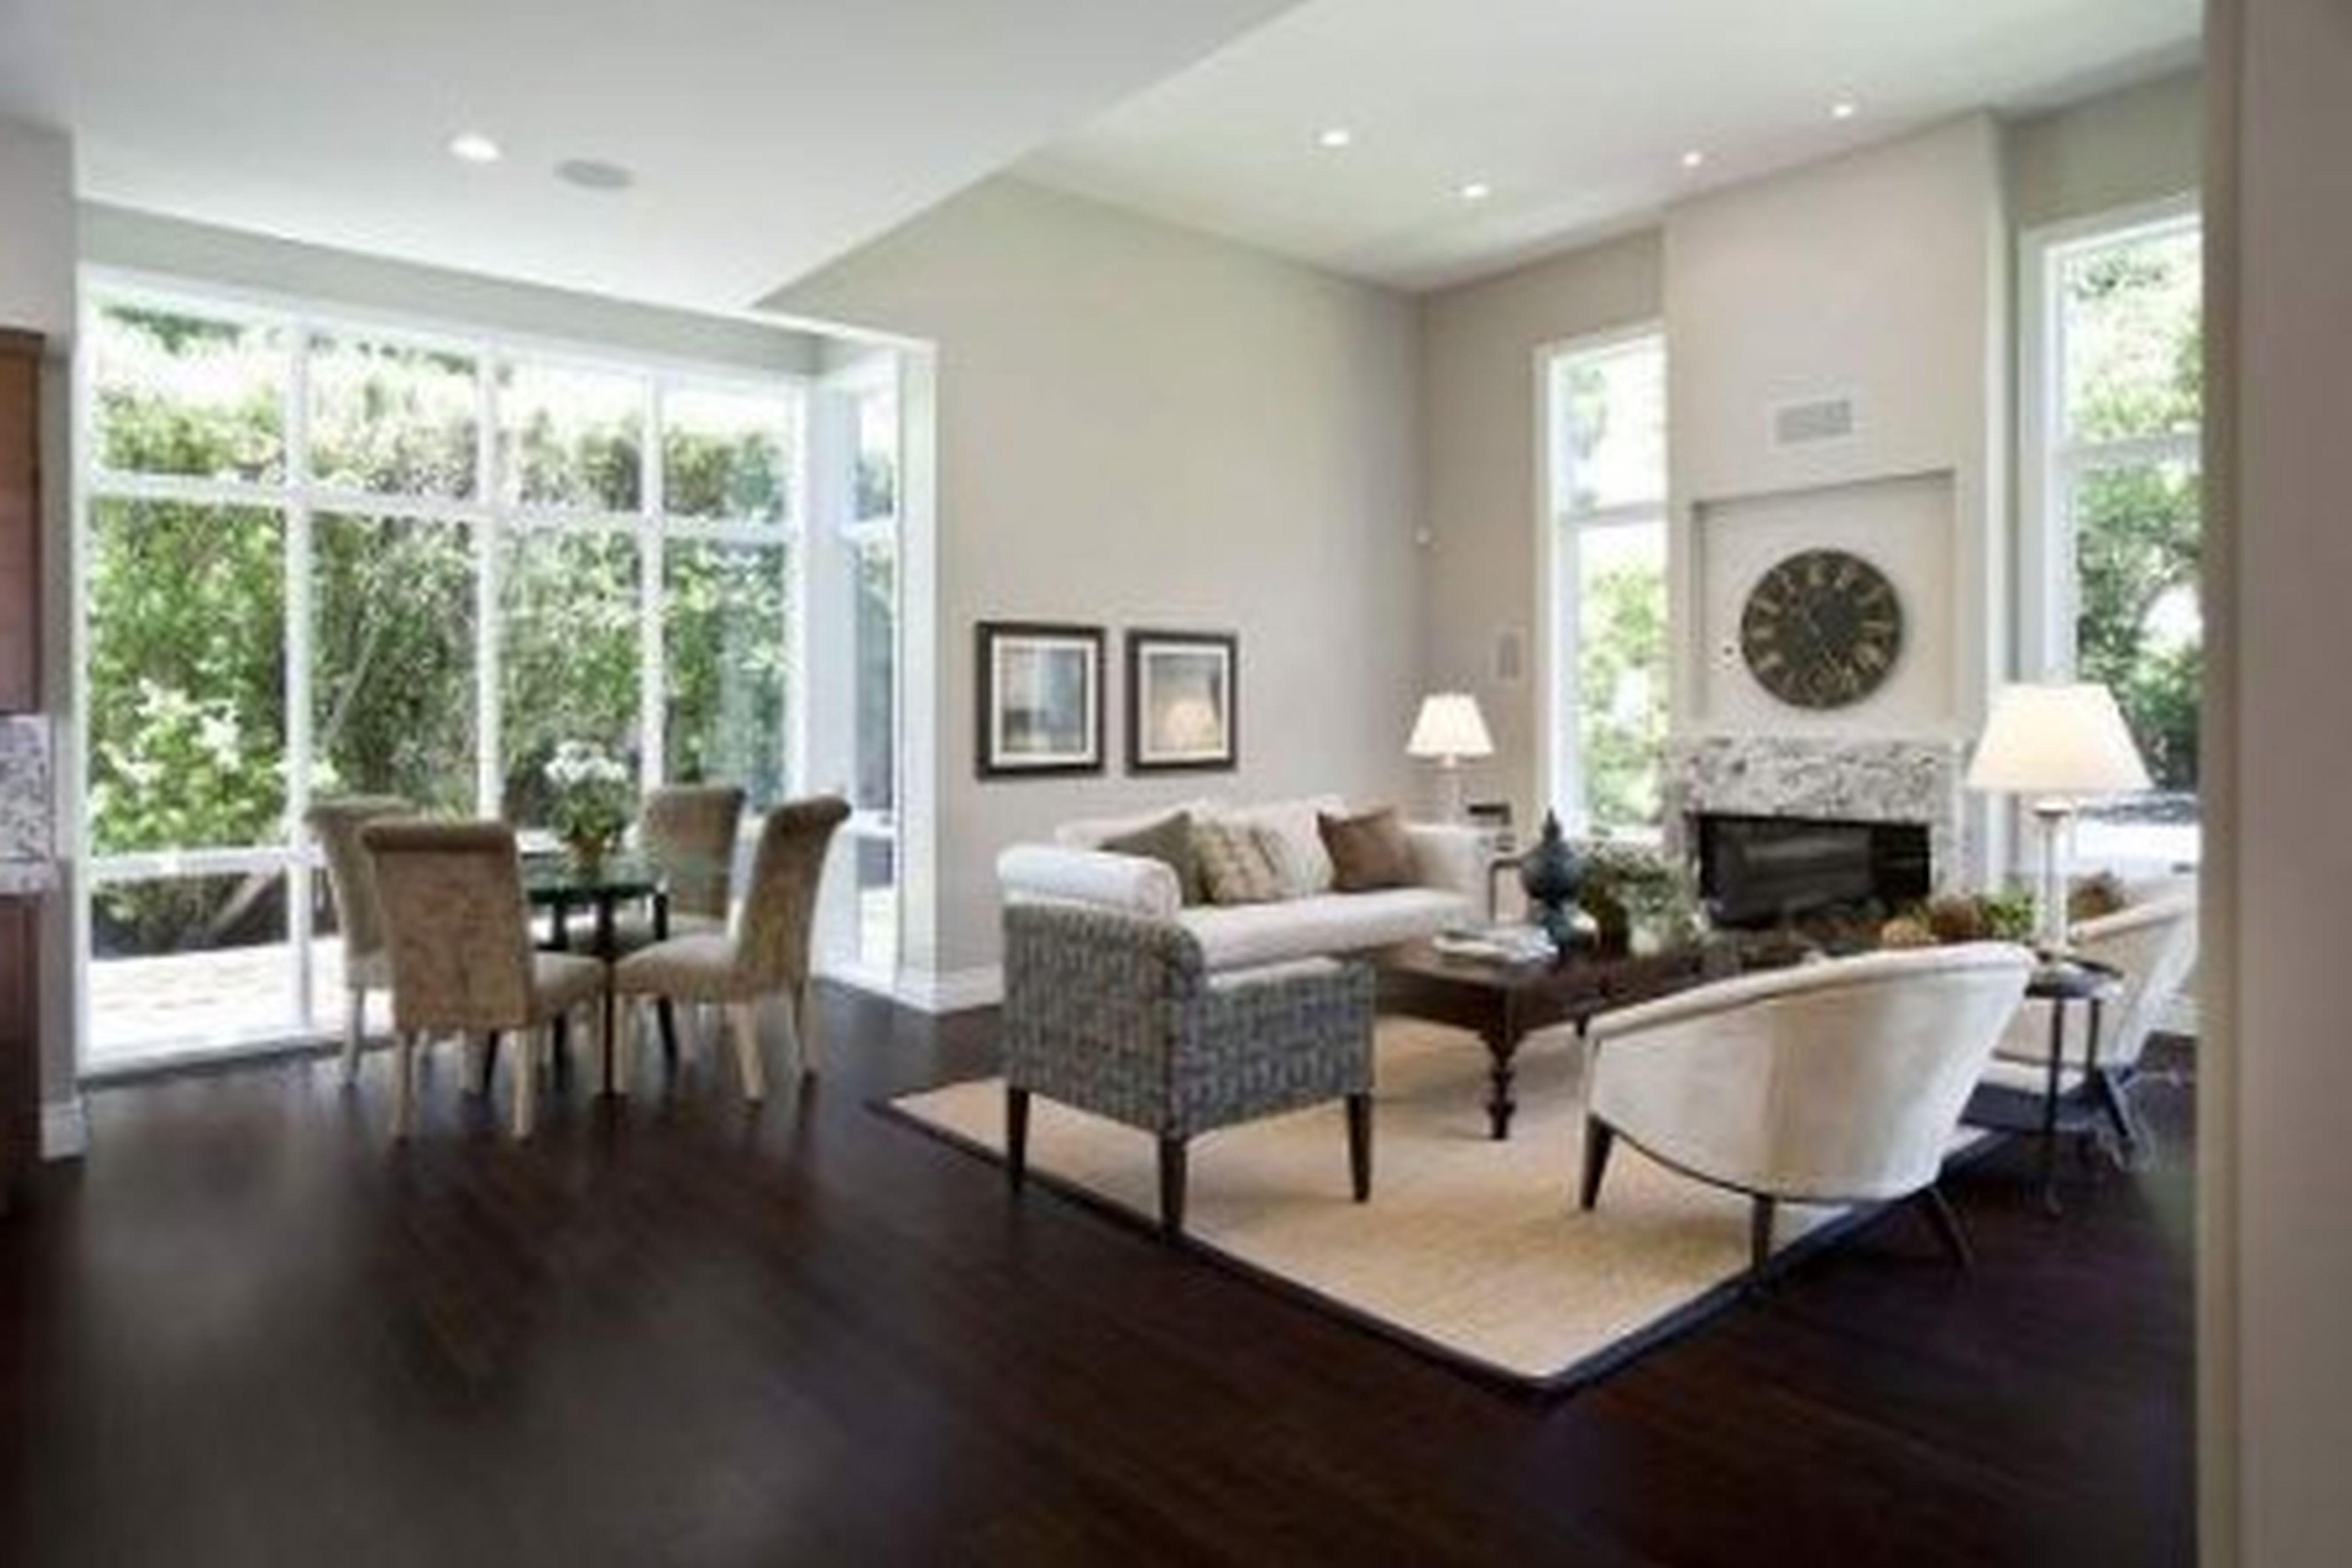 hardwood-floor-interior hardwood-floor-interior